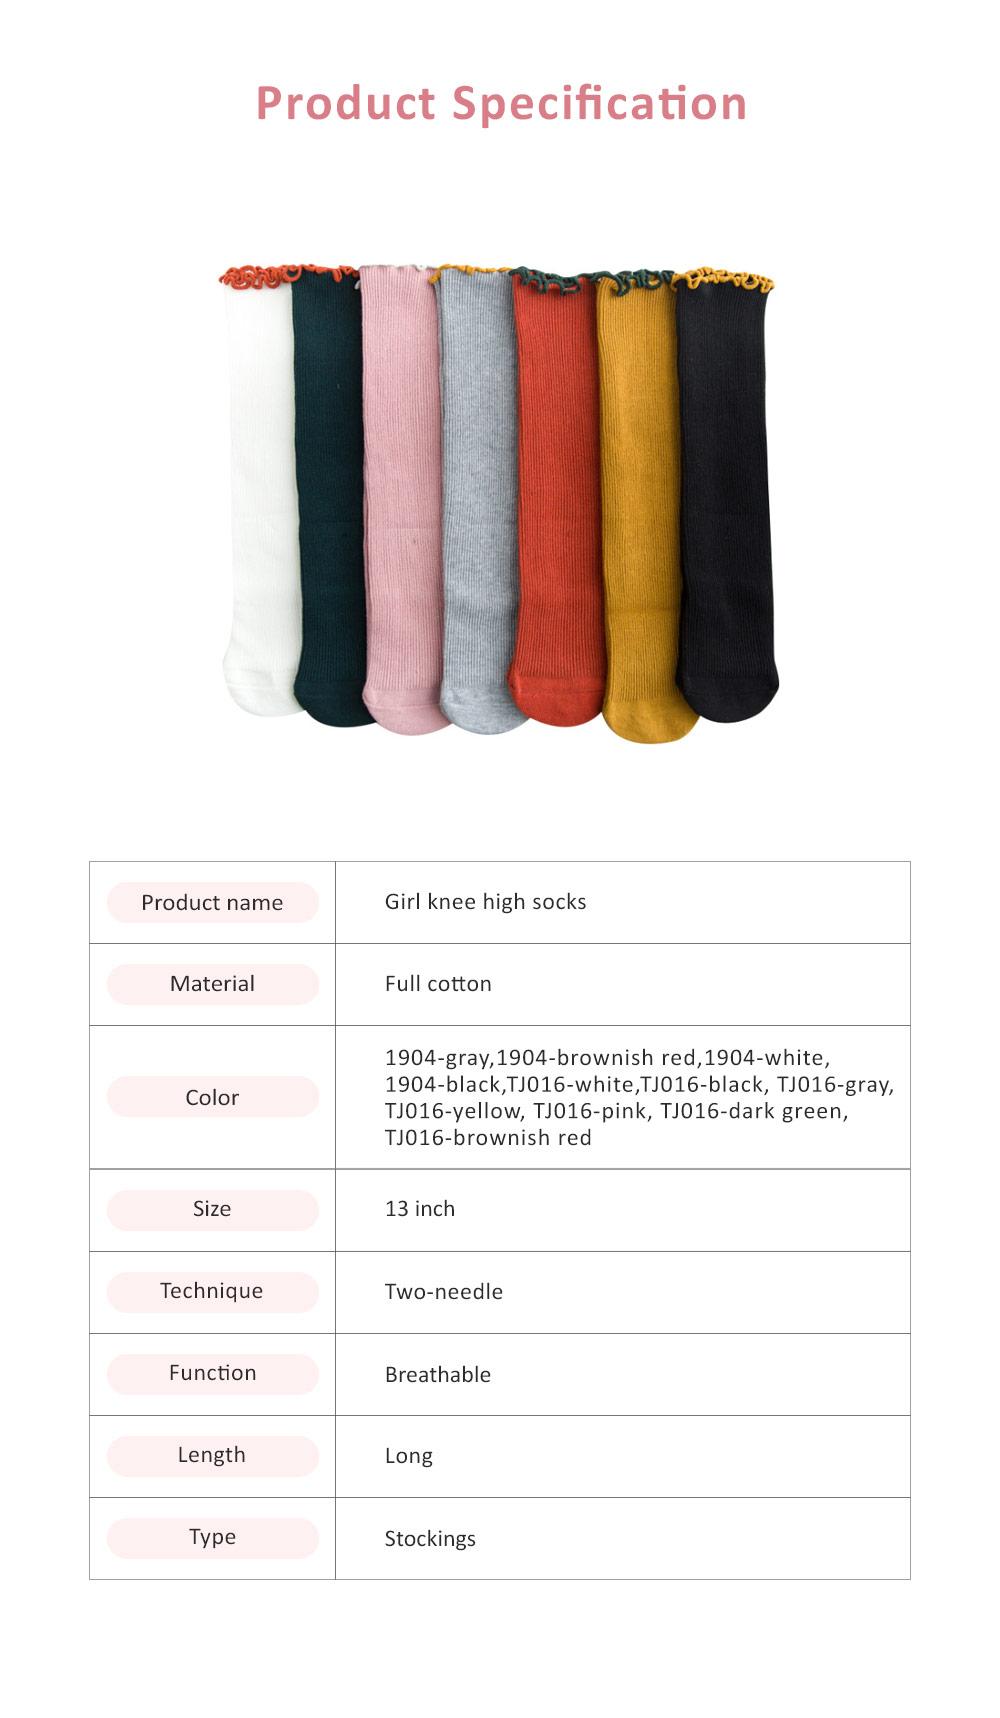 Korean Style Knee High Socks Cute Bowknot Cotton Knit Dress Socks Ruffled Shape Baby Stocking for Girls 7